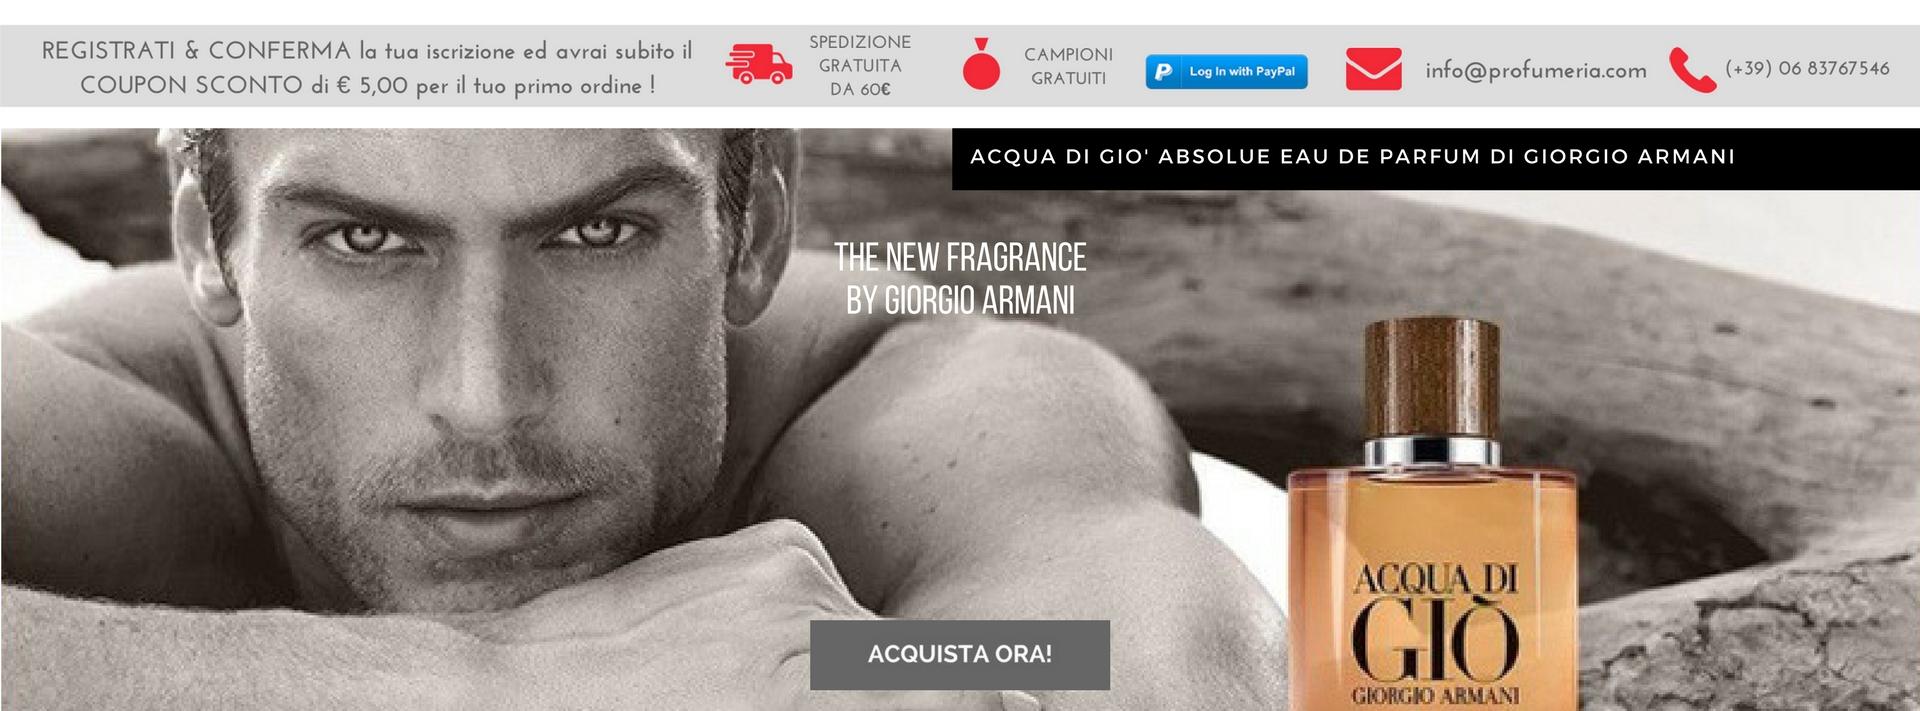 Giorgio Armani ACQUA DI GIO' ABSOLUE EAU DE PARFUM The New Fragrance !